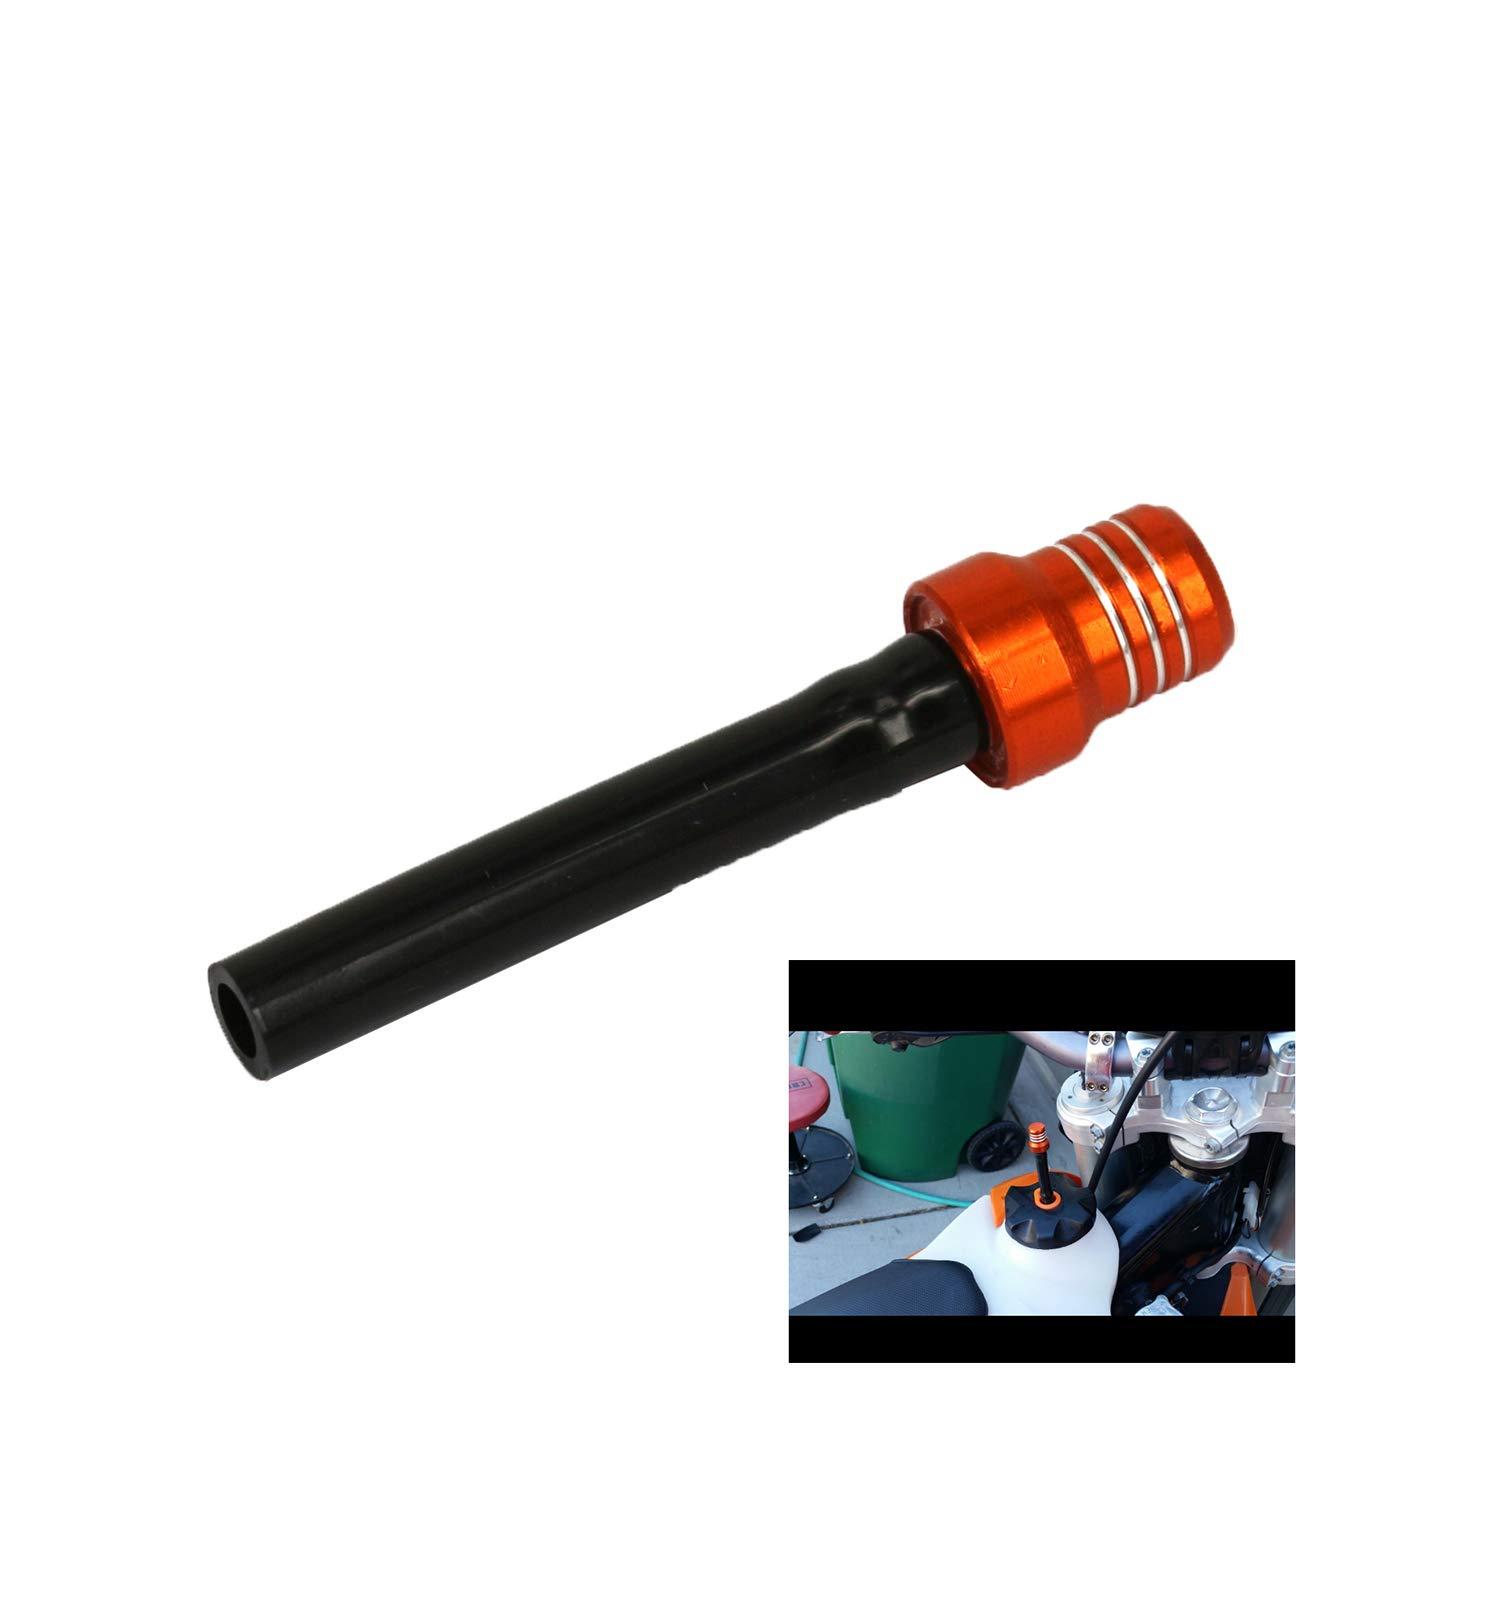 Billet Gas Fuel Cap Oil Filler Cap Air Vent Hose Tube Breather Hose For Suzuki RM125 RM250 RMZ250 RM